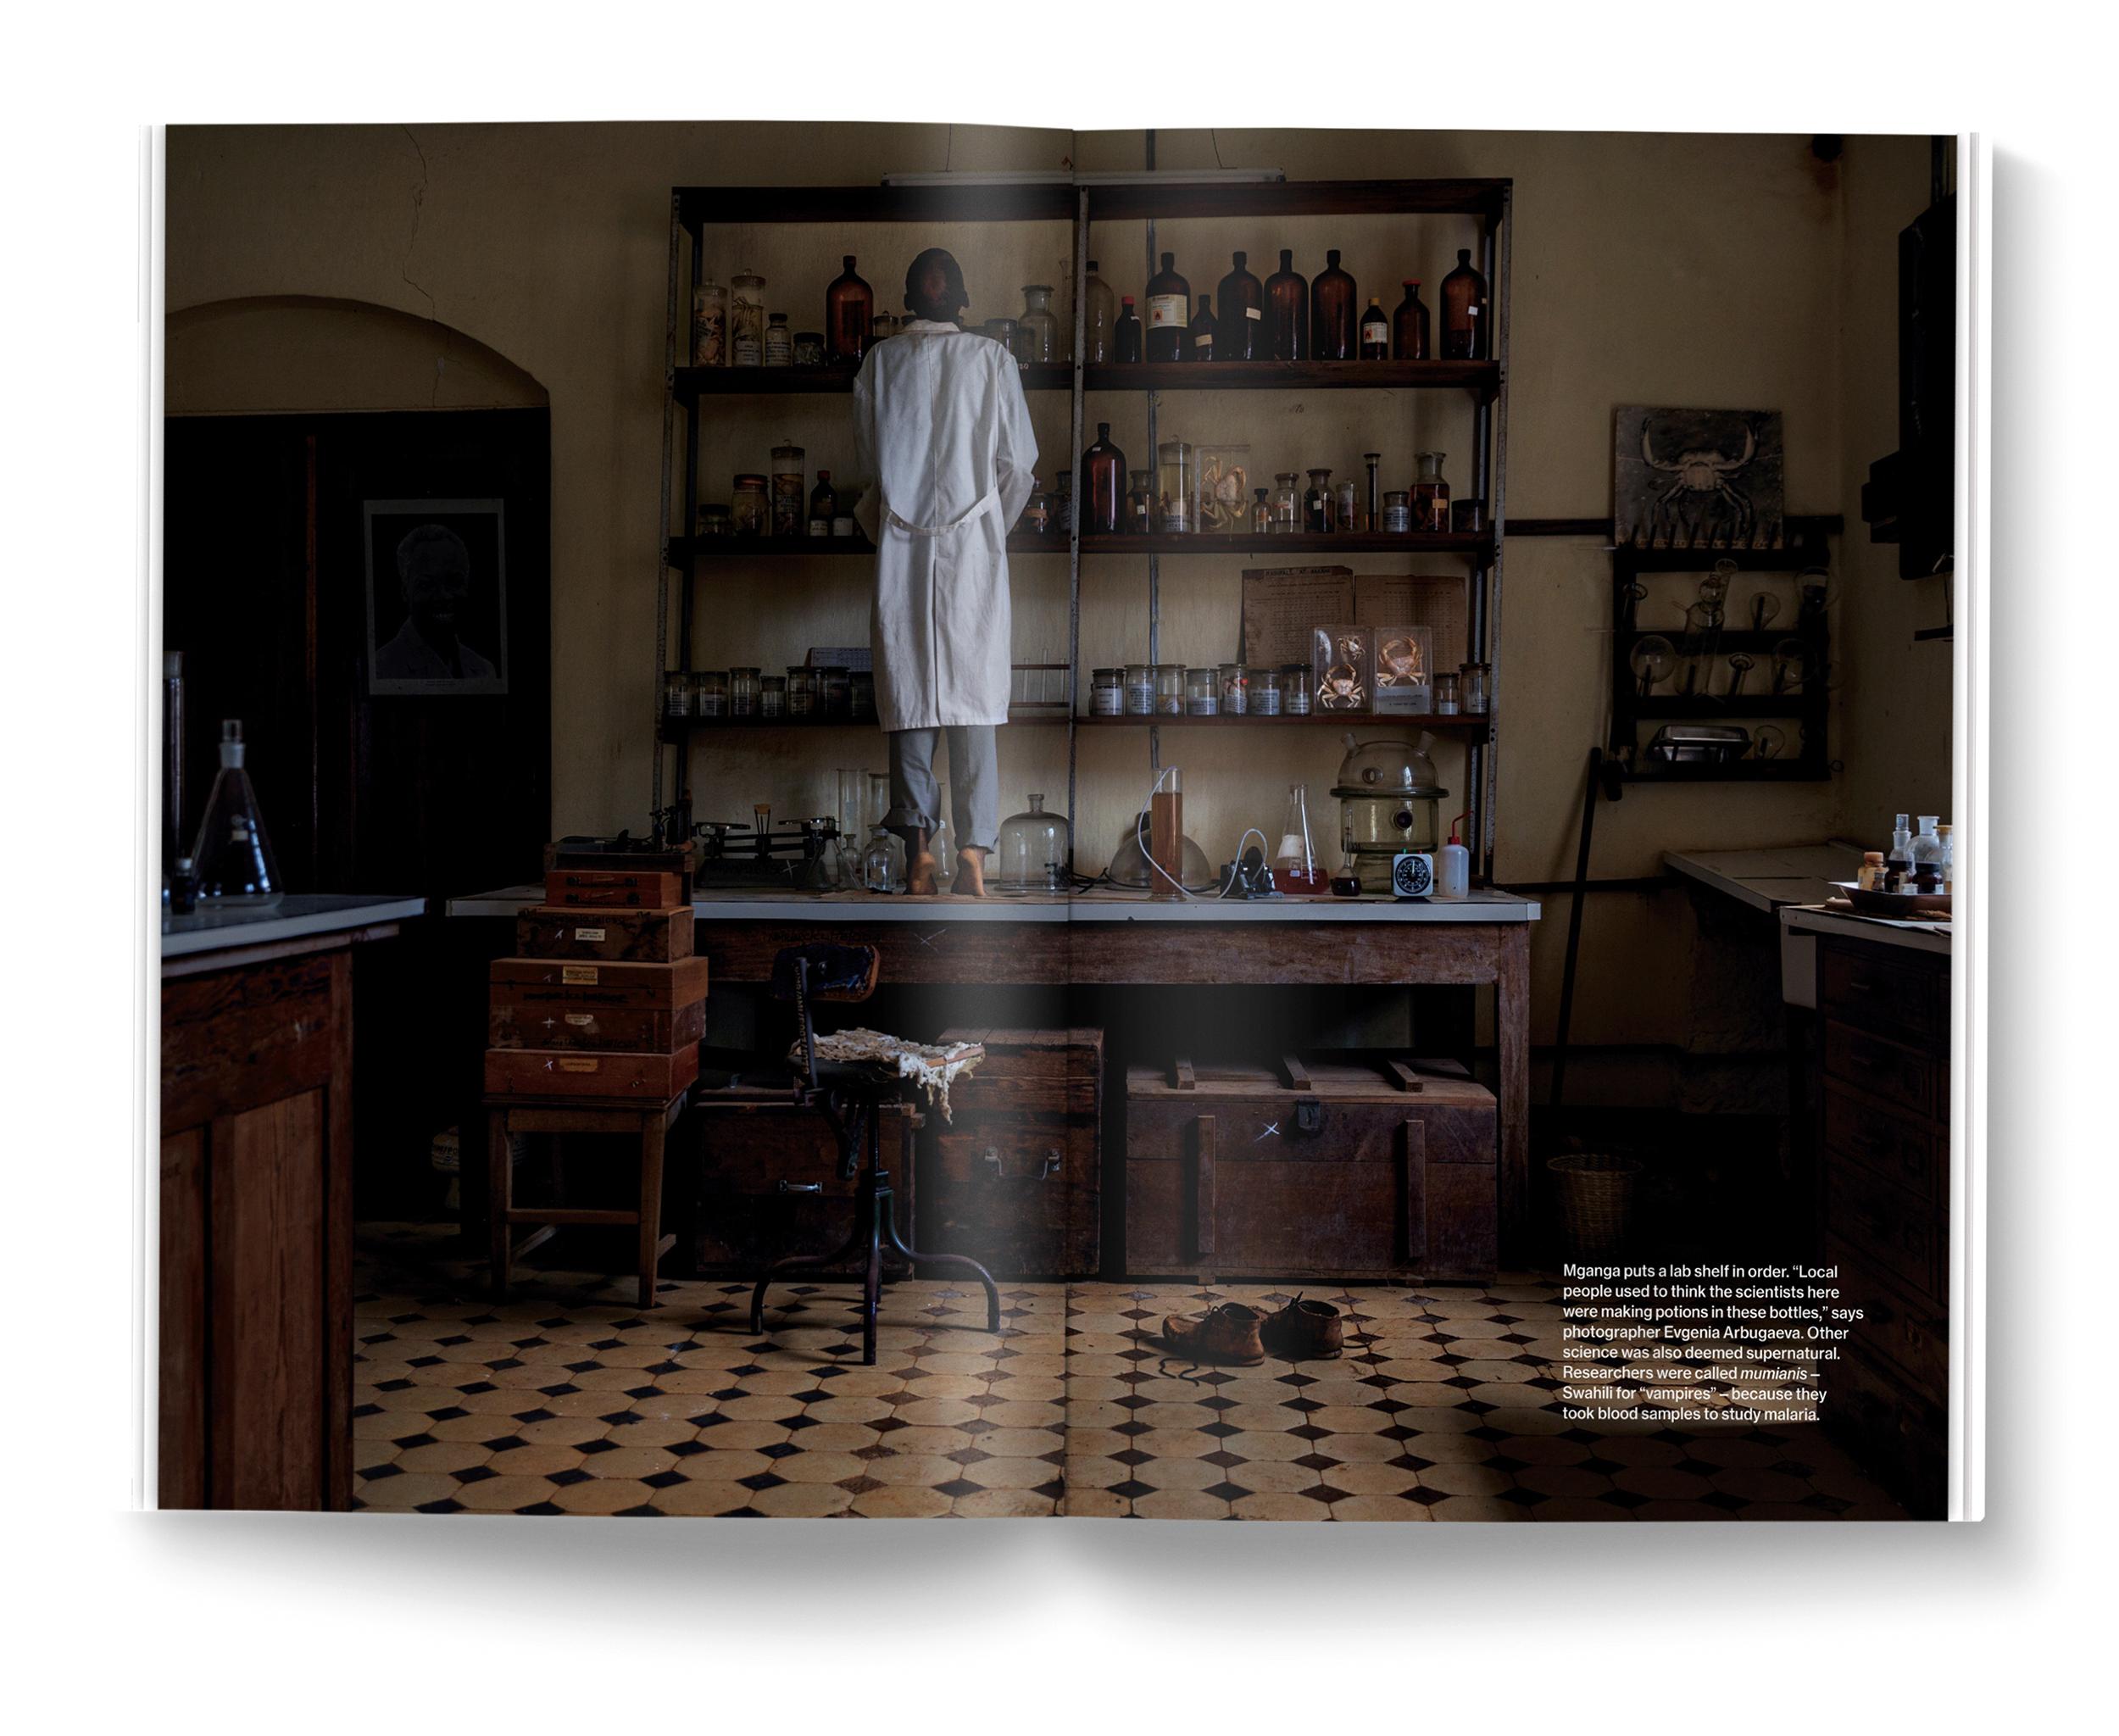 Amani a project by  Evgenia Arbugaeva .